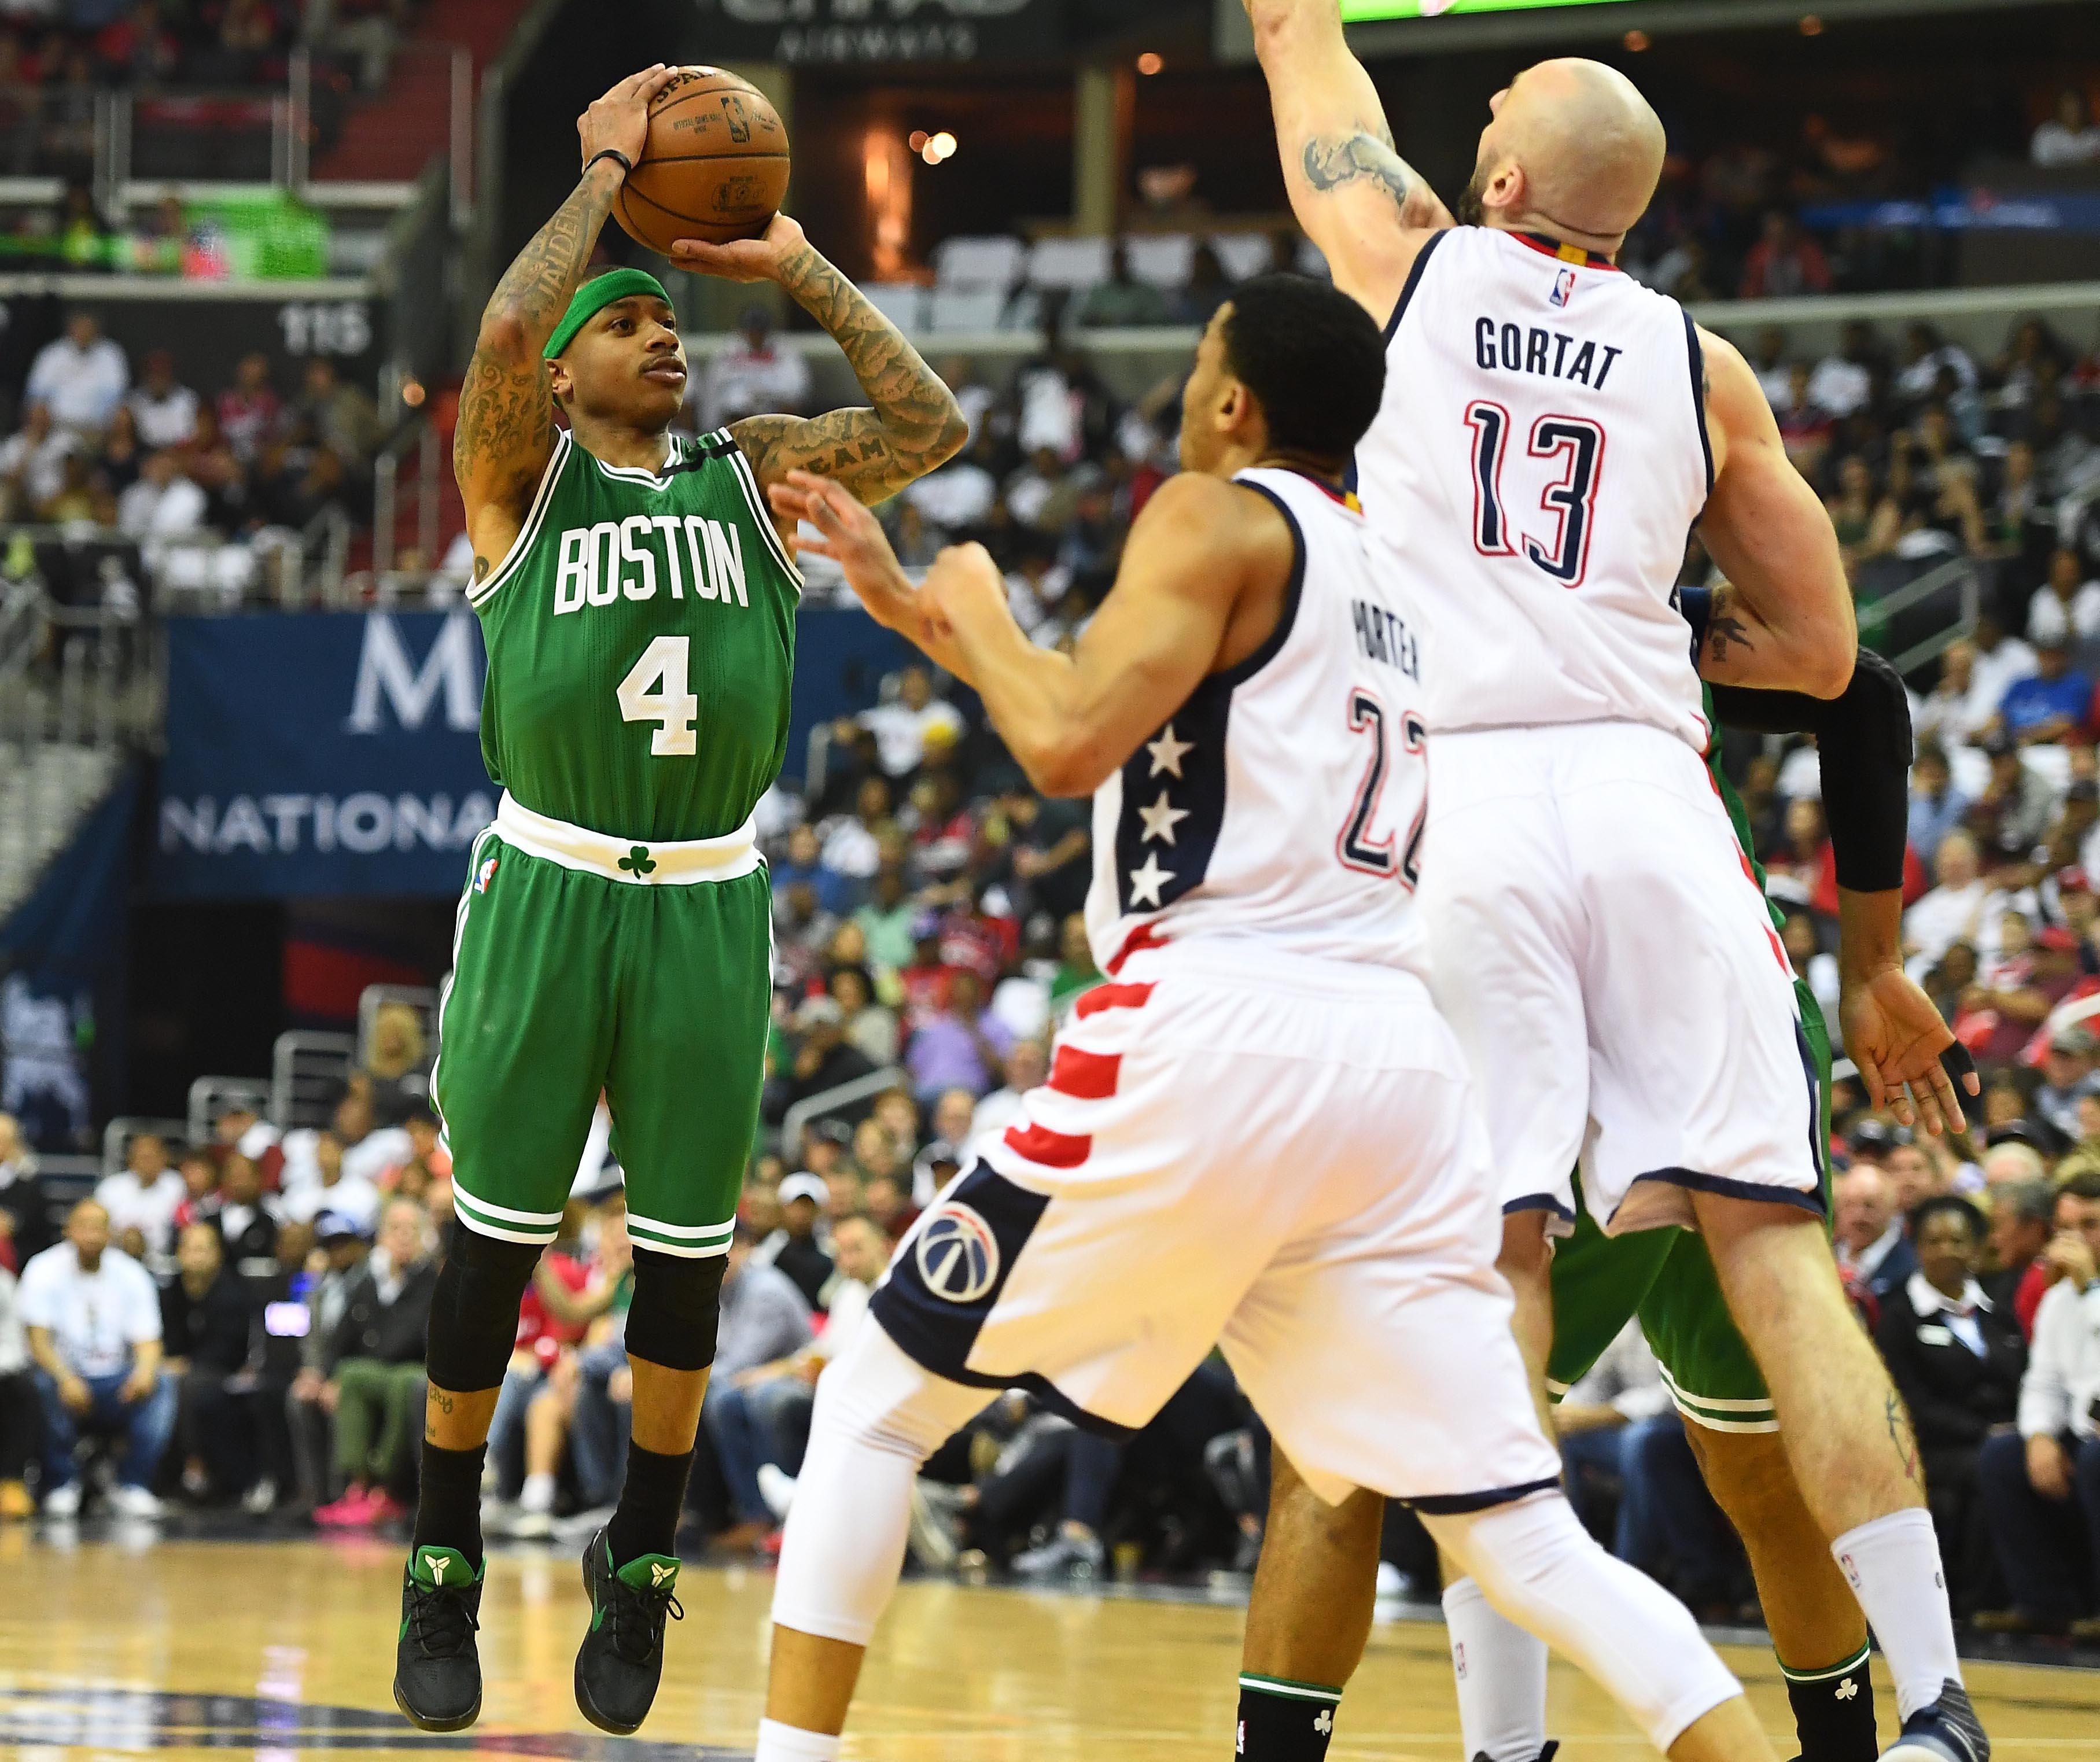 Boston Vs Warriors Live Stream Free: NBA Playoffs 2017: Wizards Vs. Celtics Game 5 Live Stream